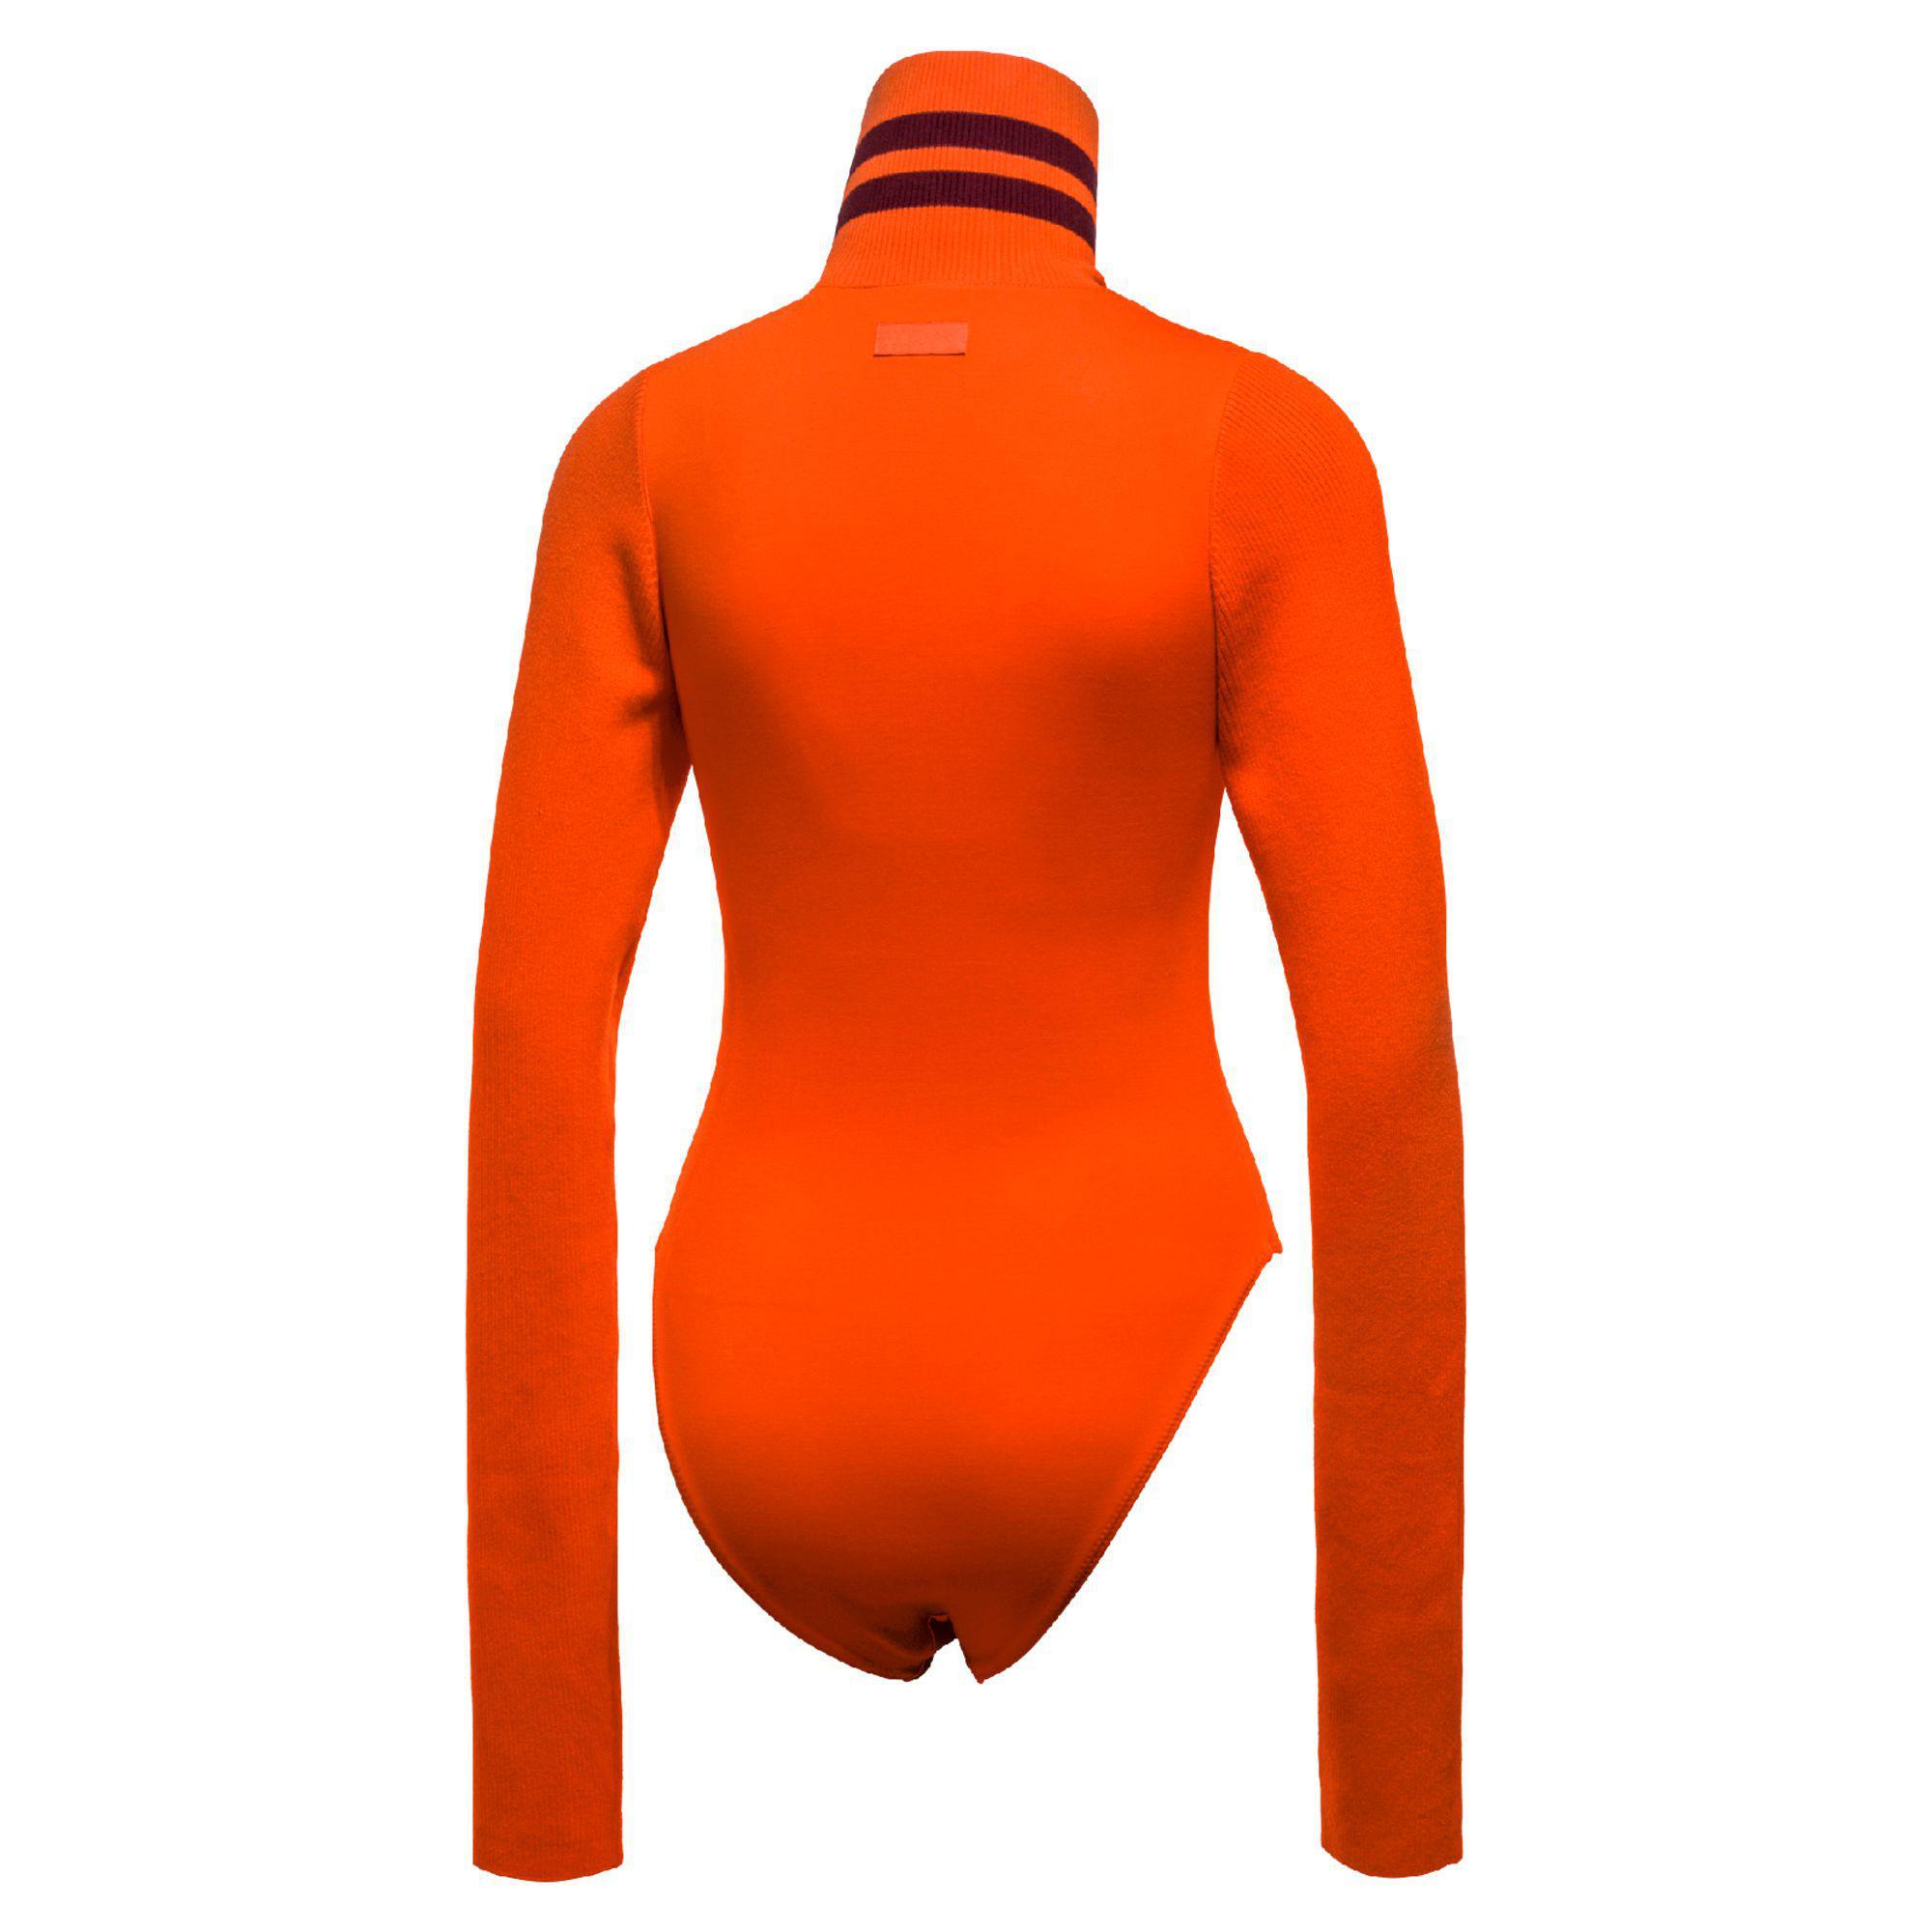 961ad25e17 PUMA Orange Fenty Women's Longsleeve Full Zip Bodysuit